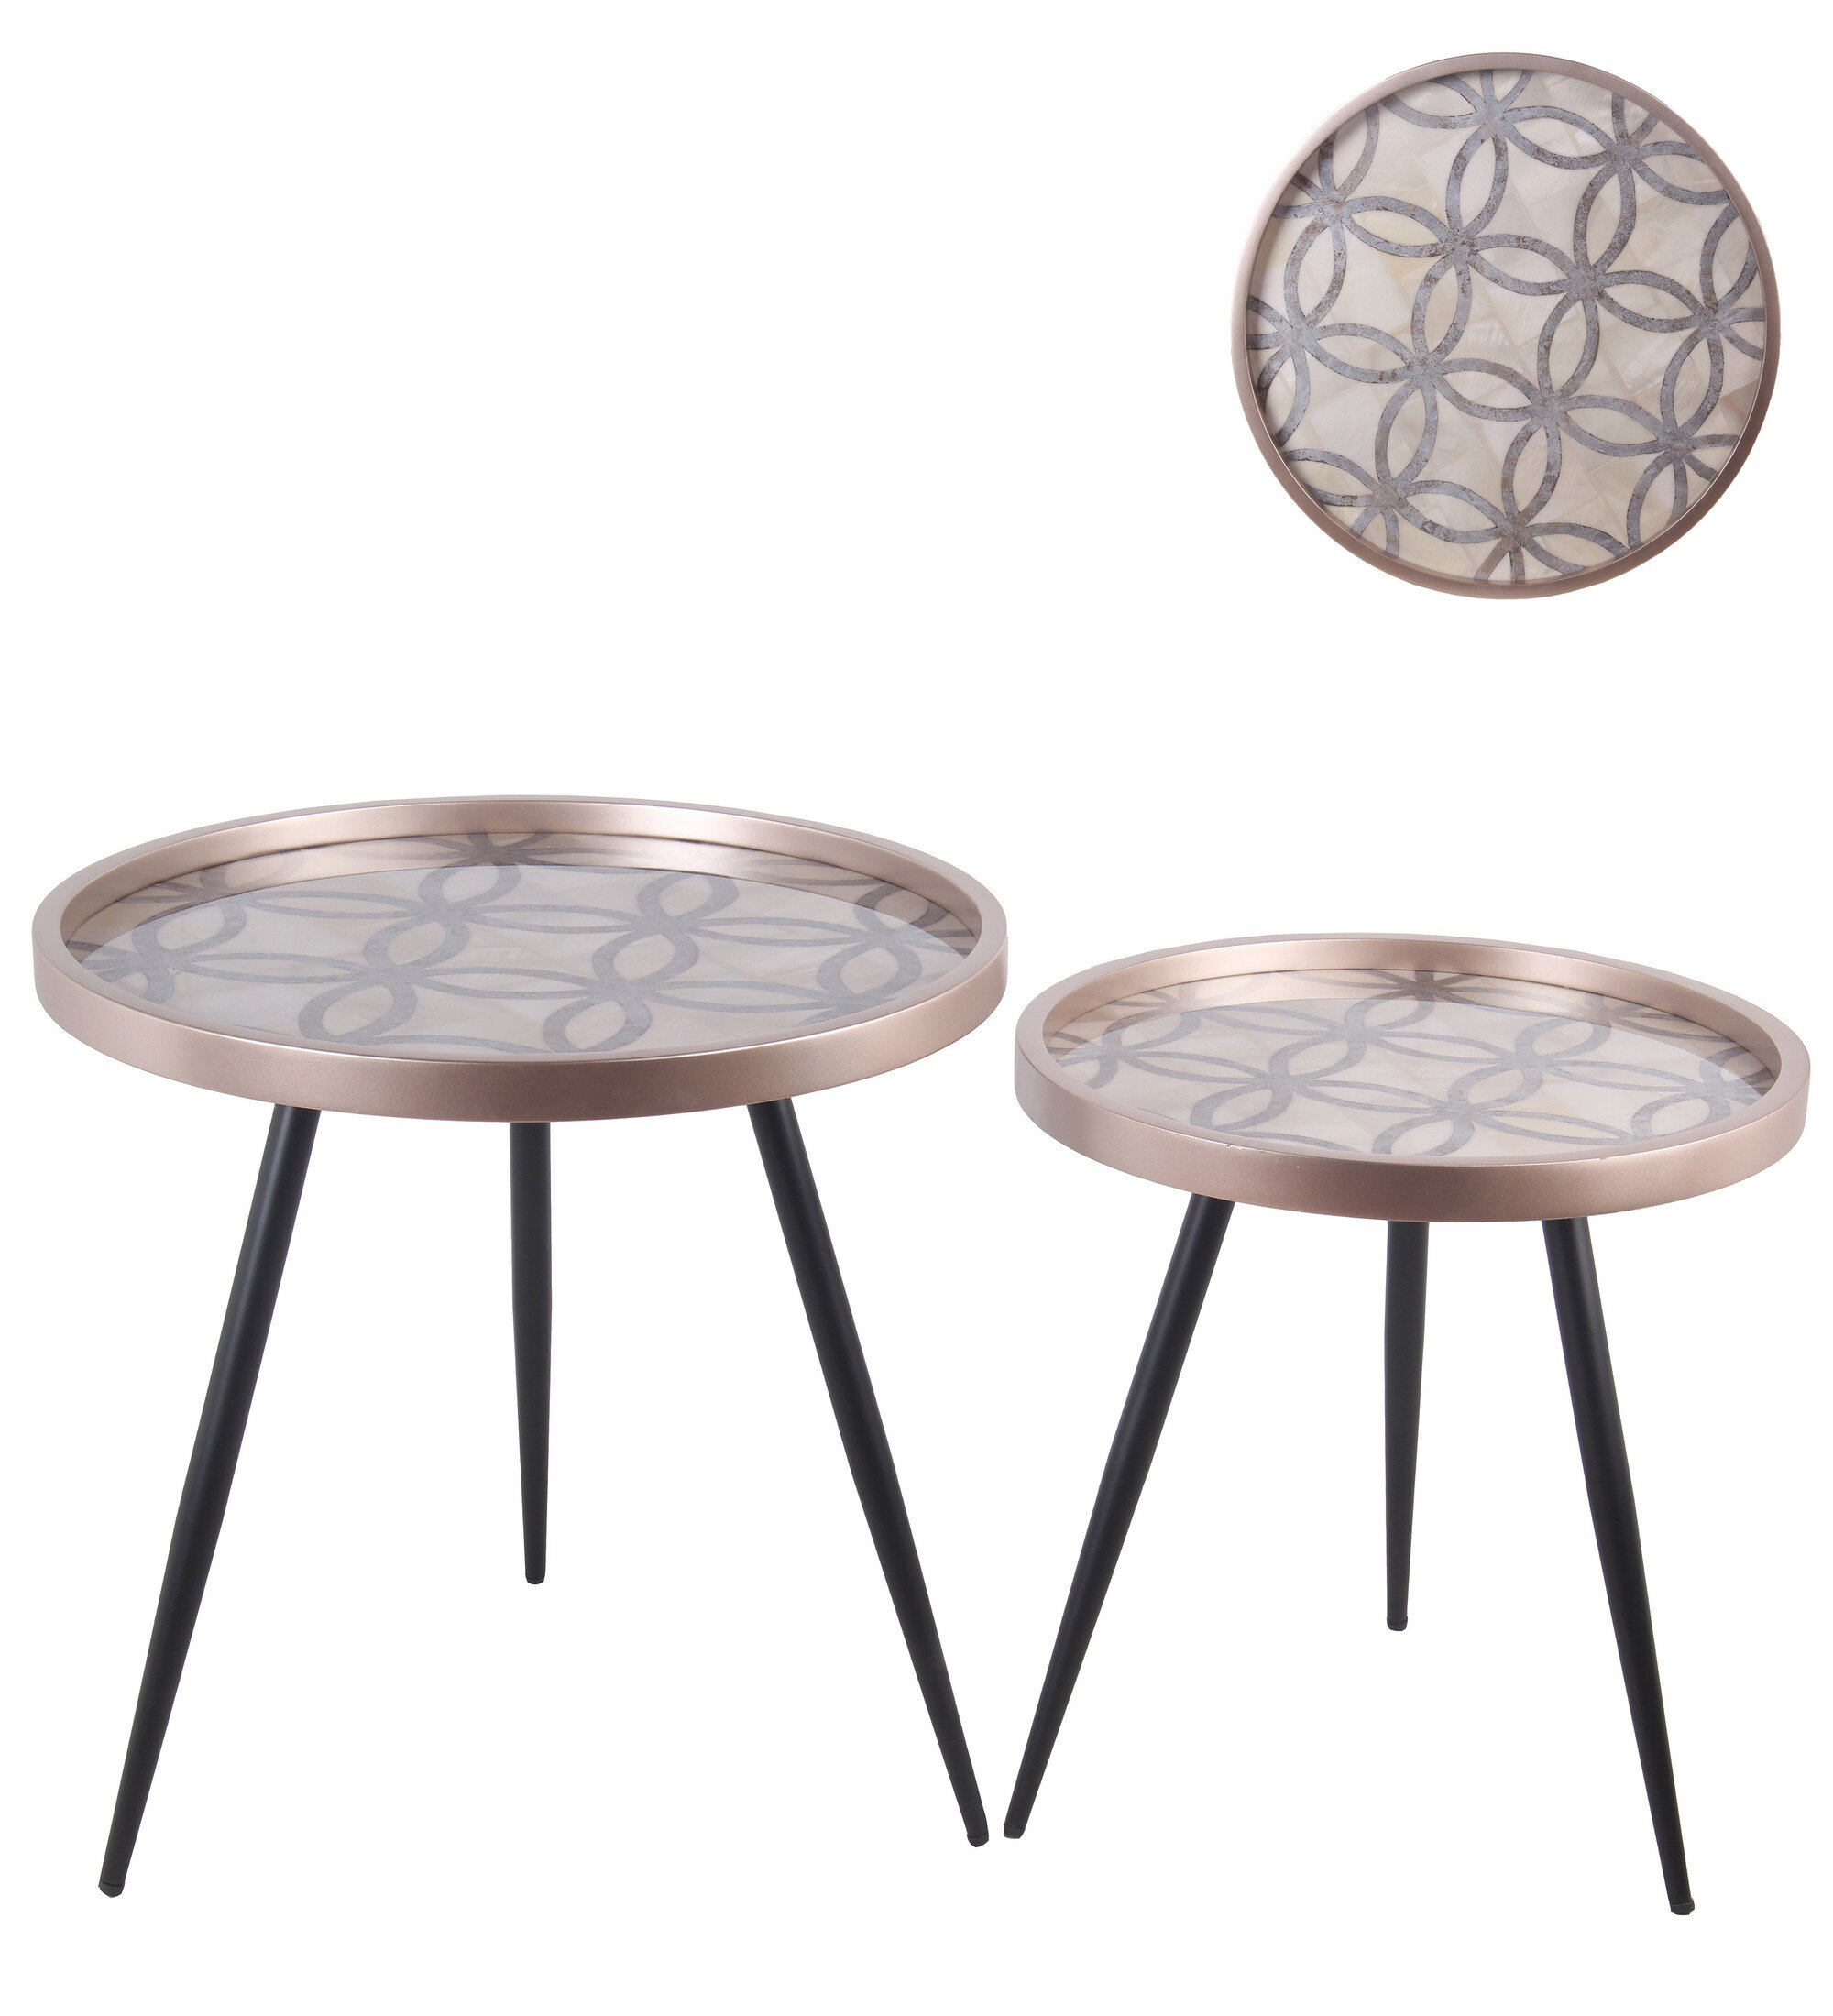 Corrigan Studio Maisha Tray Top 3 Legs Nesting Table Set Wayfair